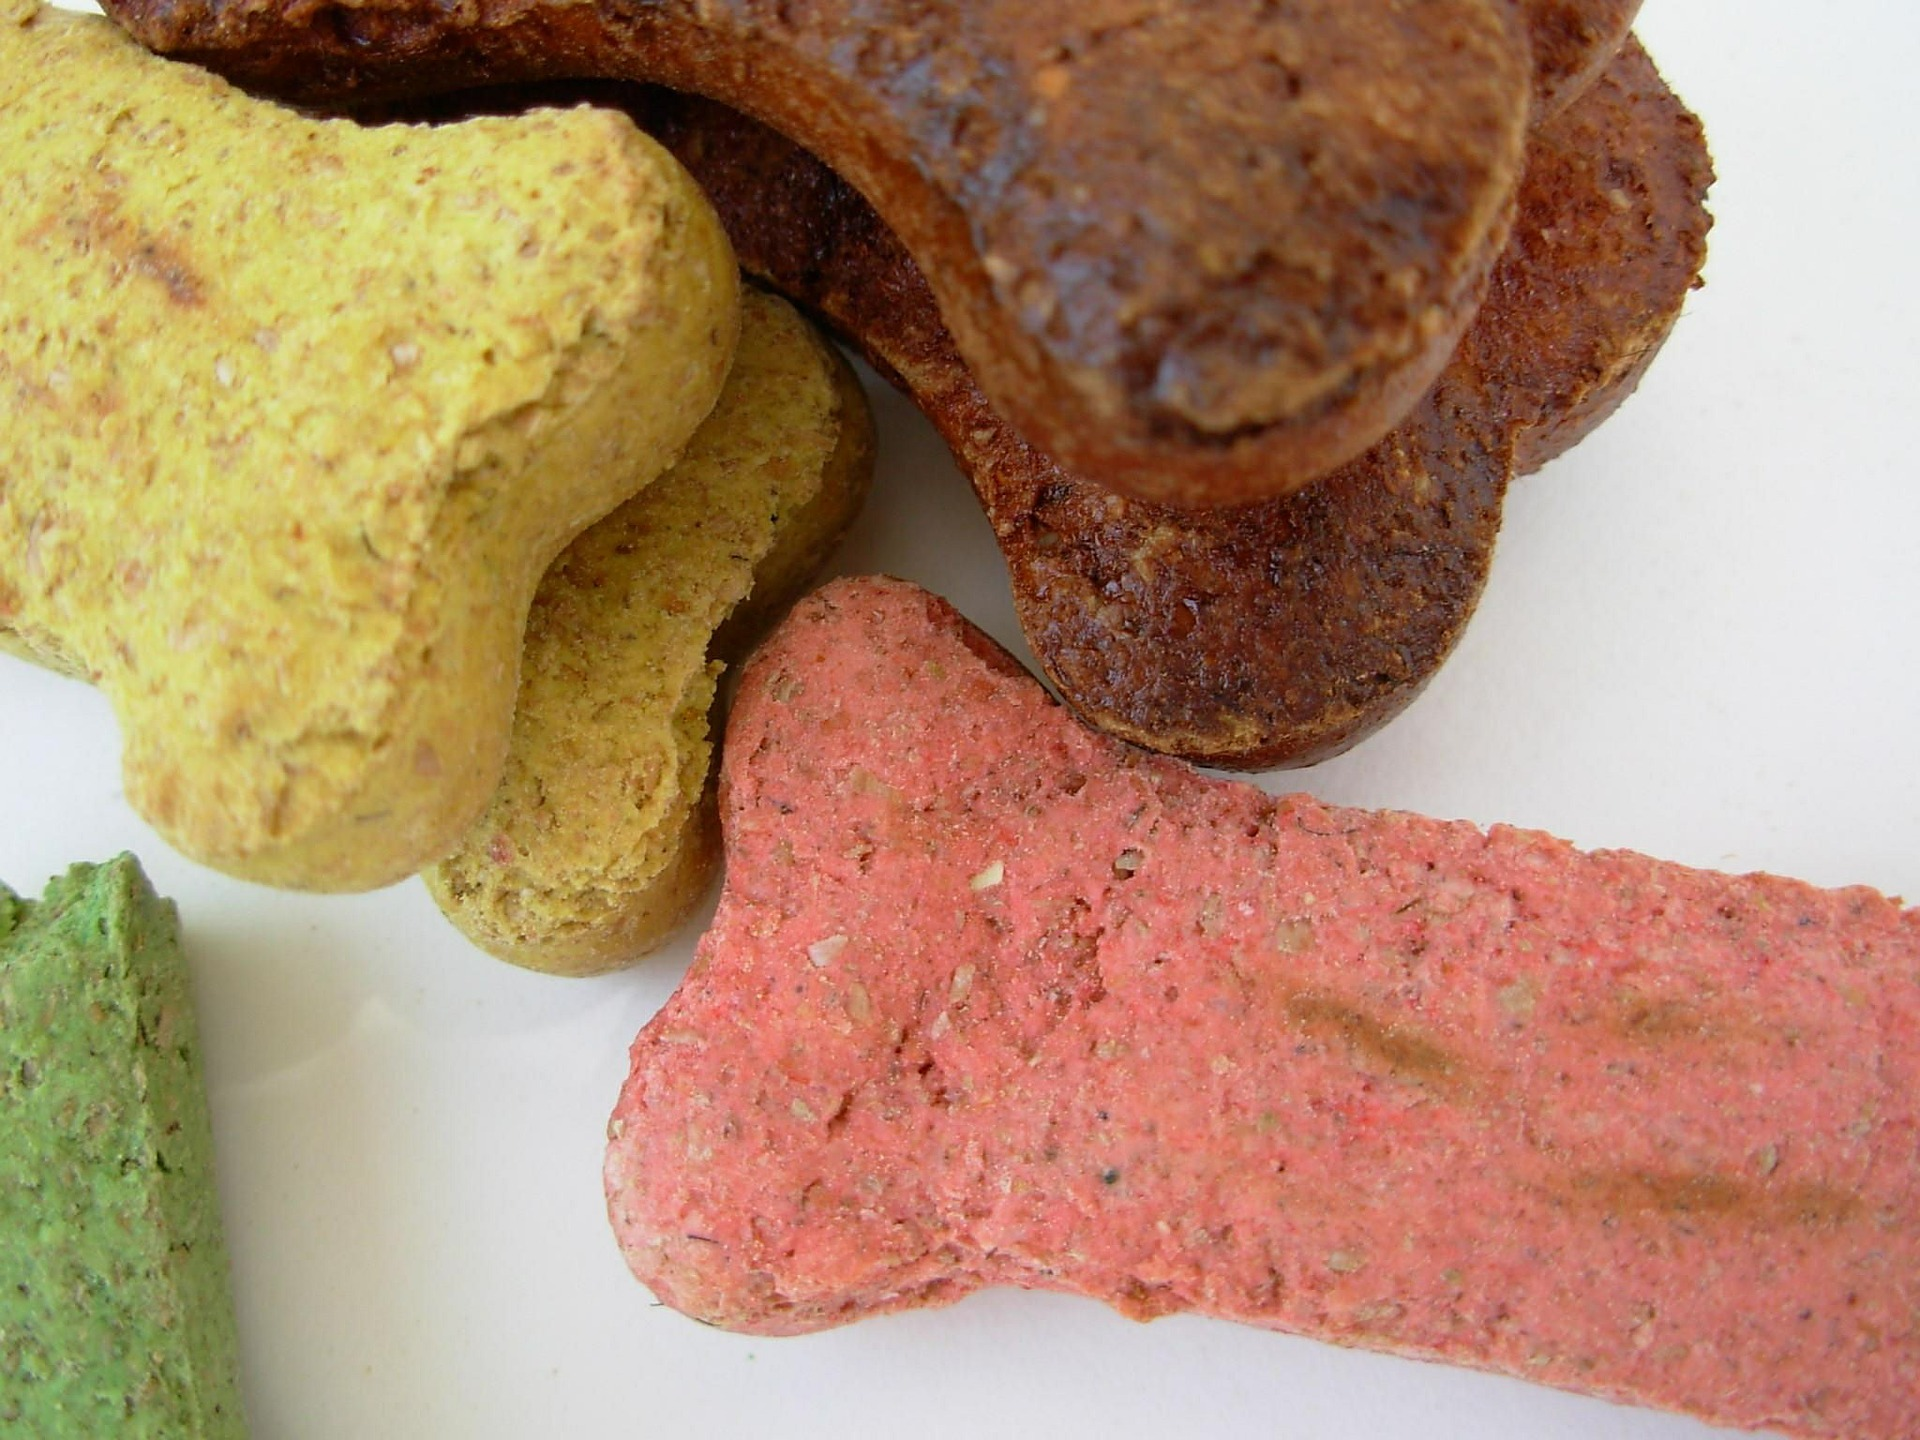 Close up shot of dog treats shaped like bones